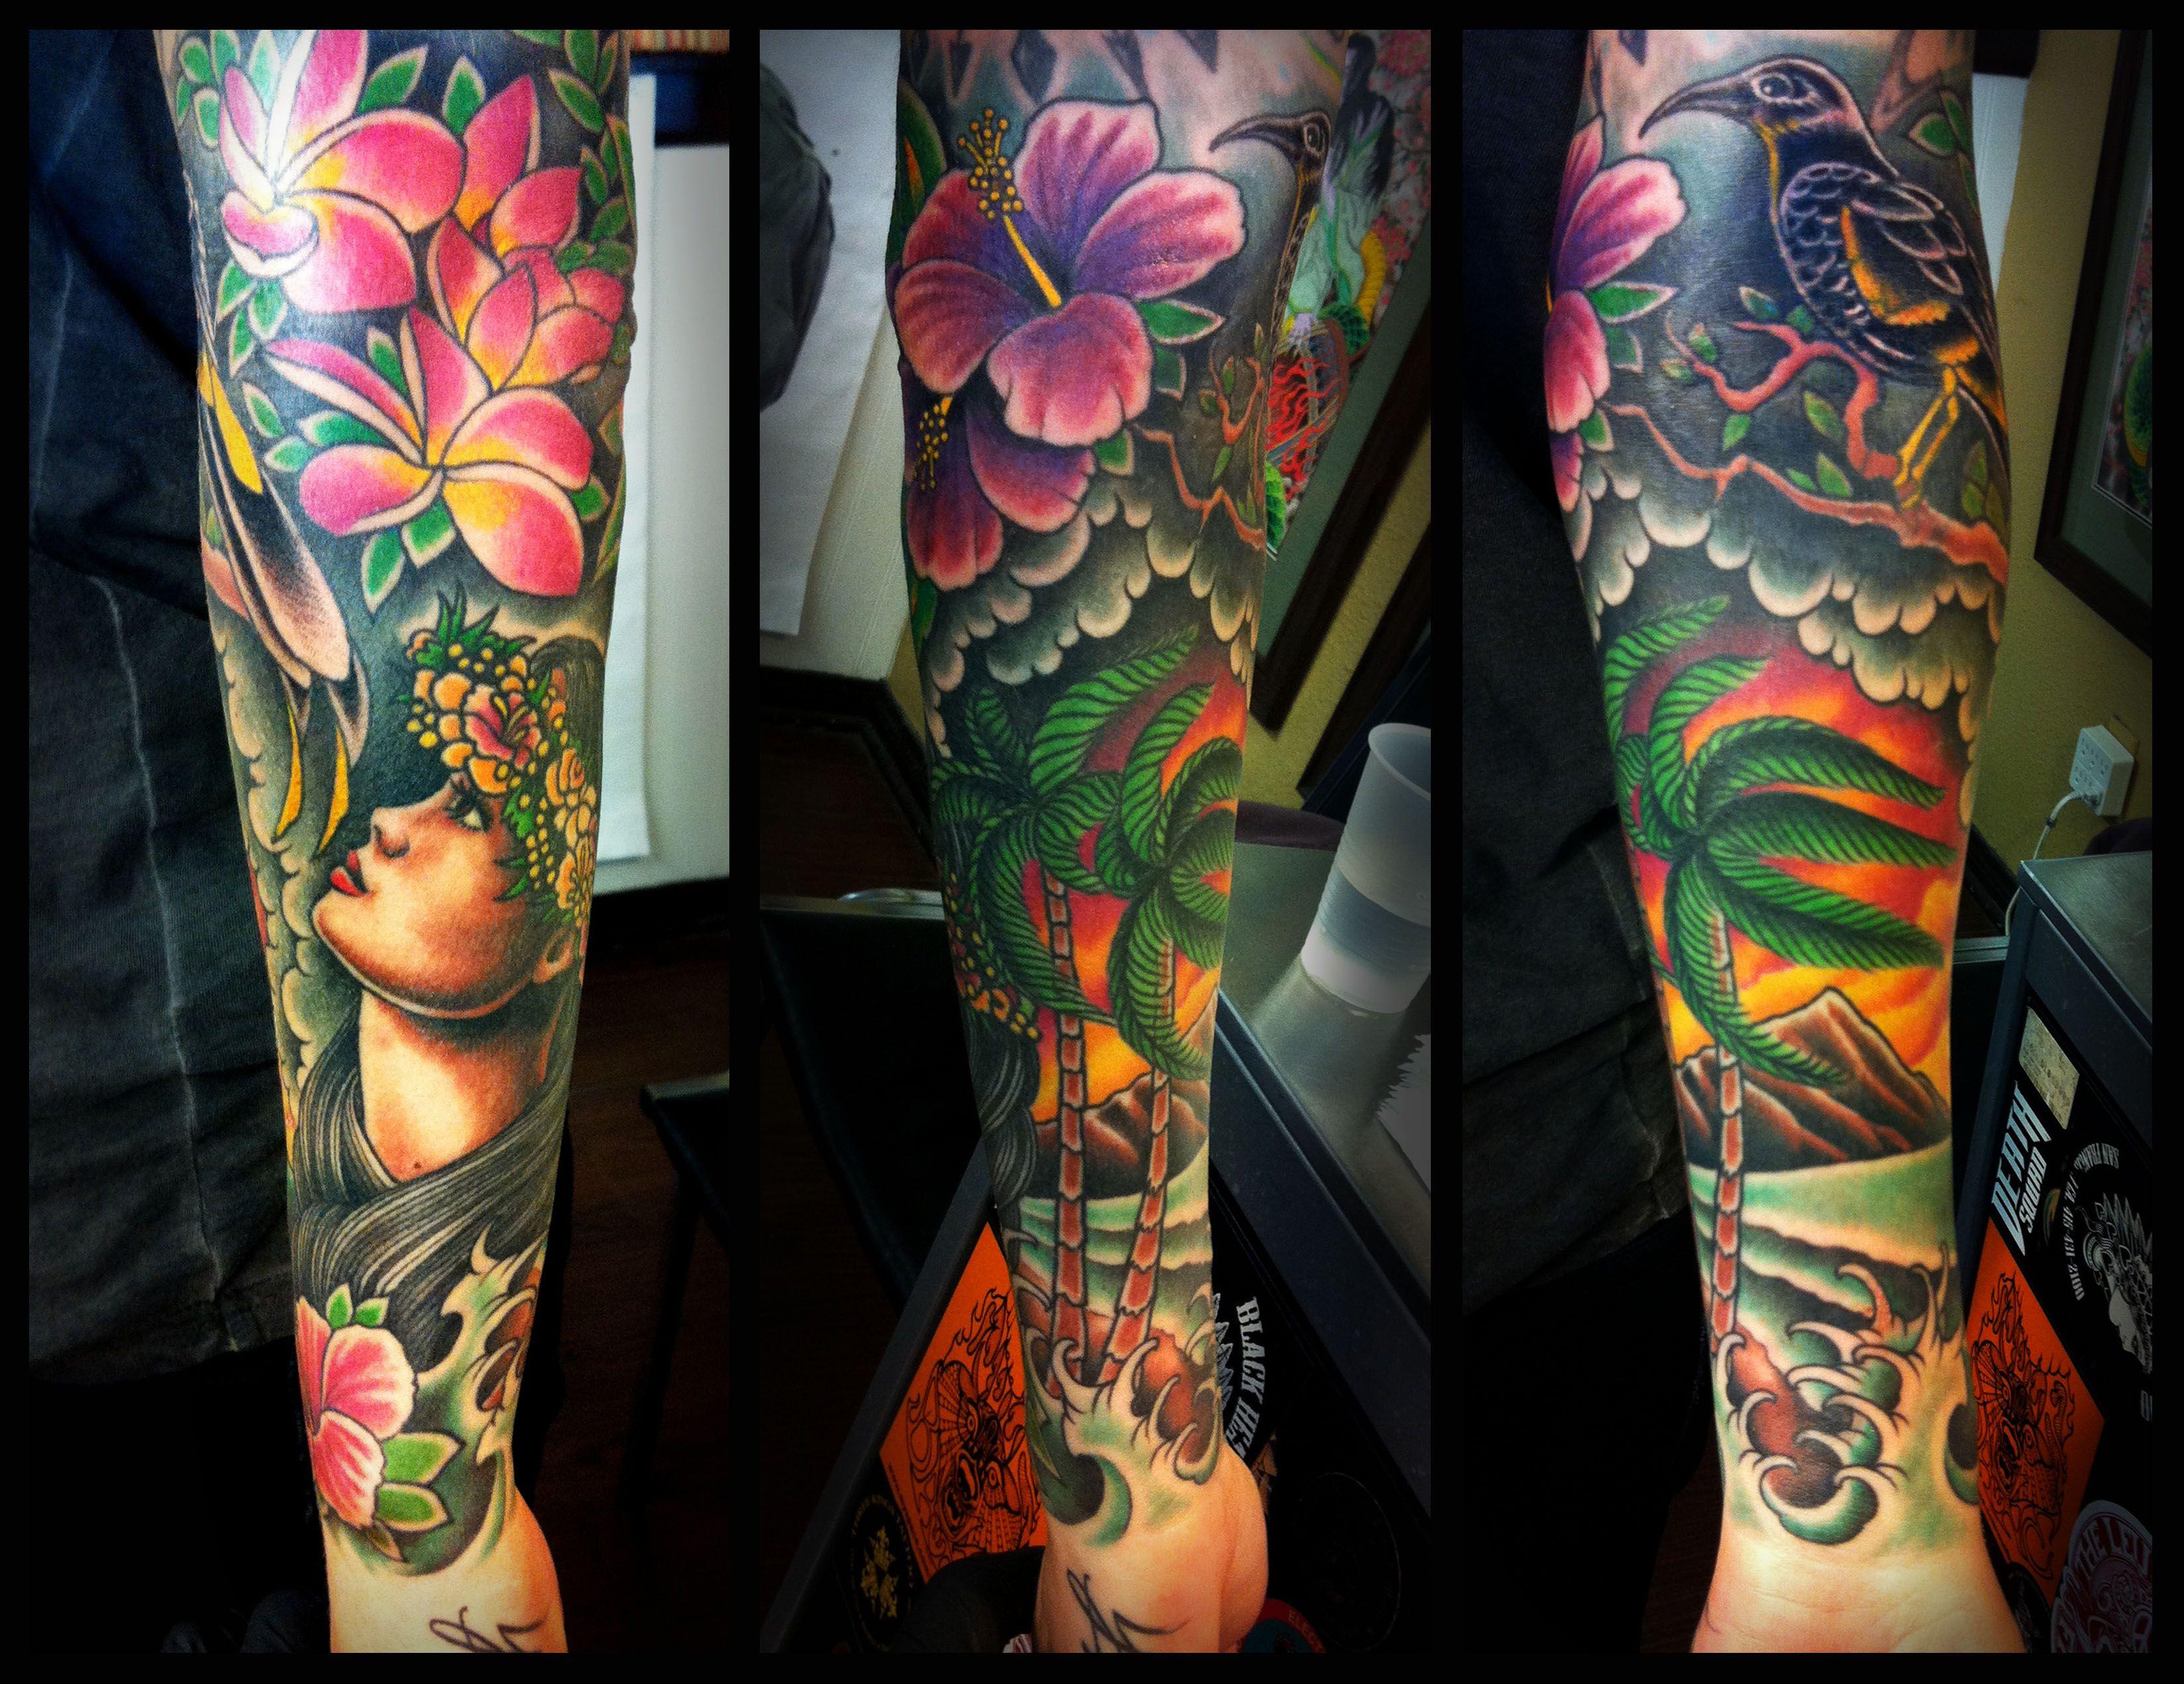 Lower leg guys traditional sleeve tattoos - Hawaiian Themed Sleeve Love The Bright Flowers